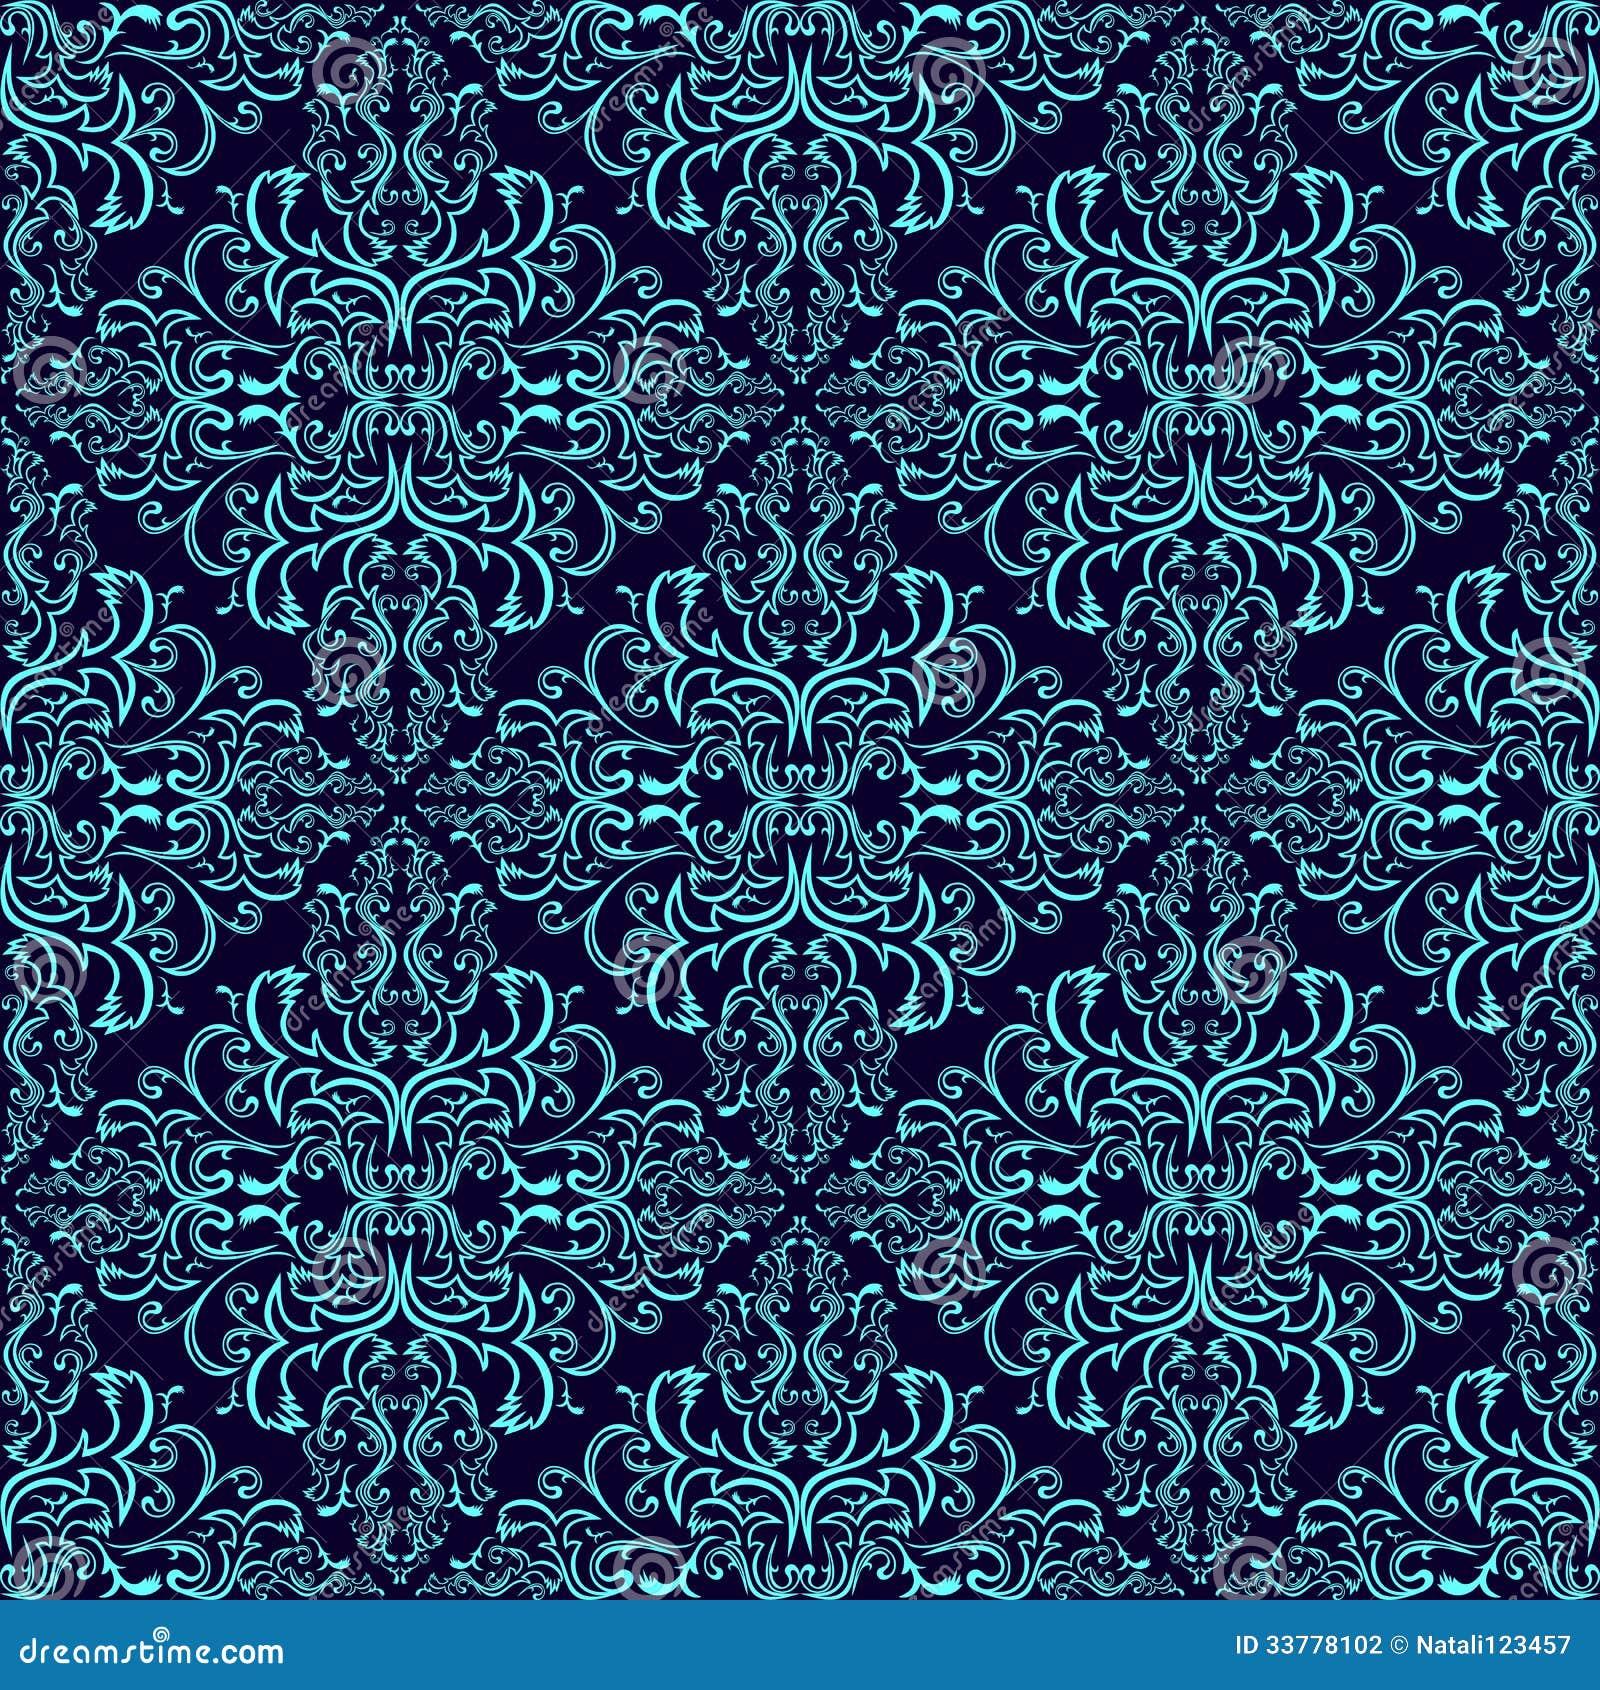 Damask Seamless Wallpaper Blue On Dark Blue Stock Vector